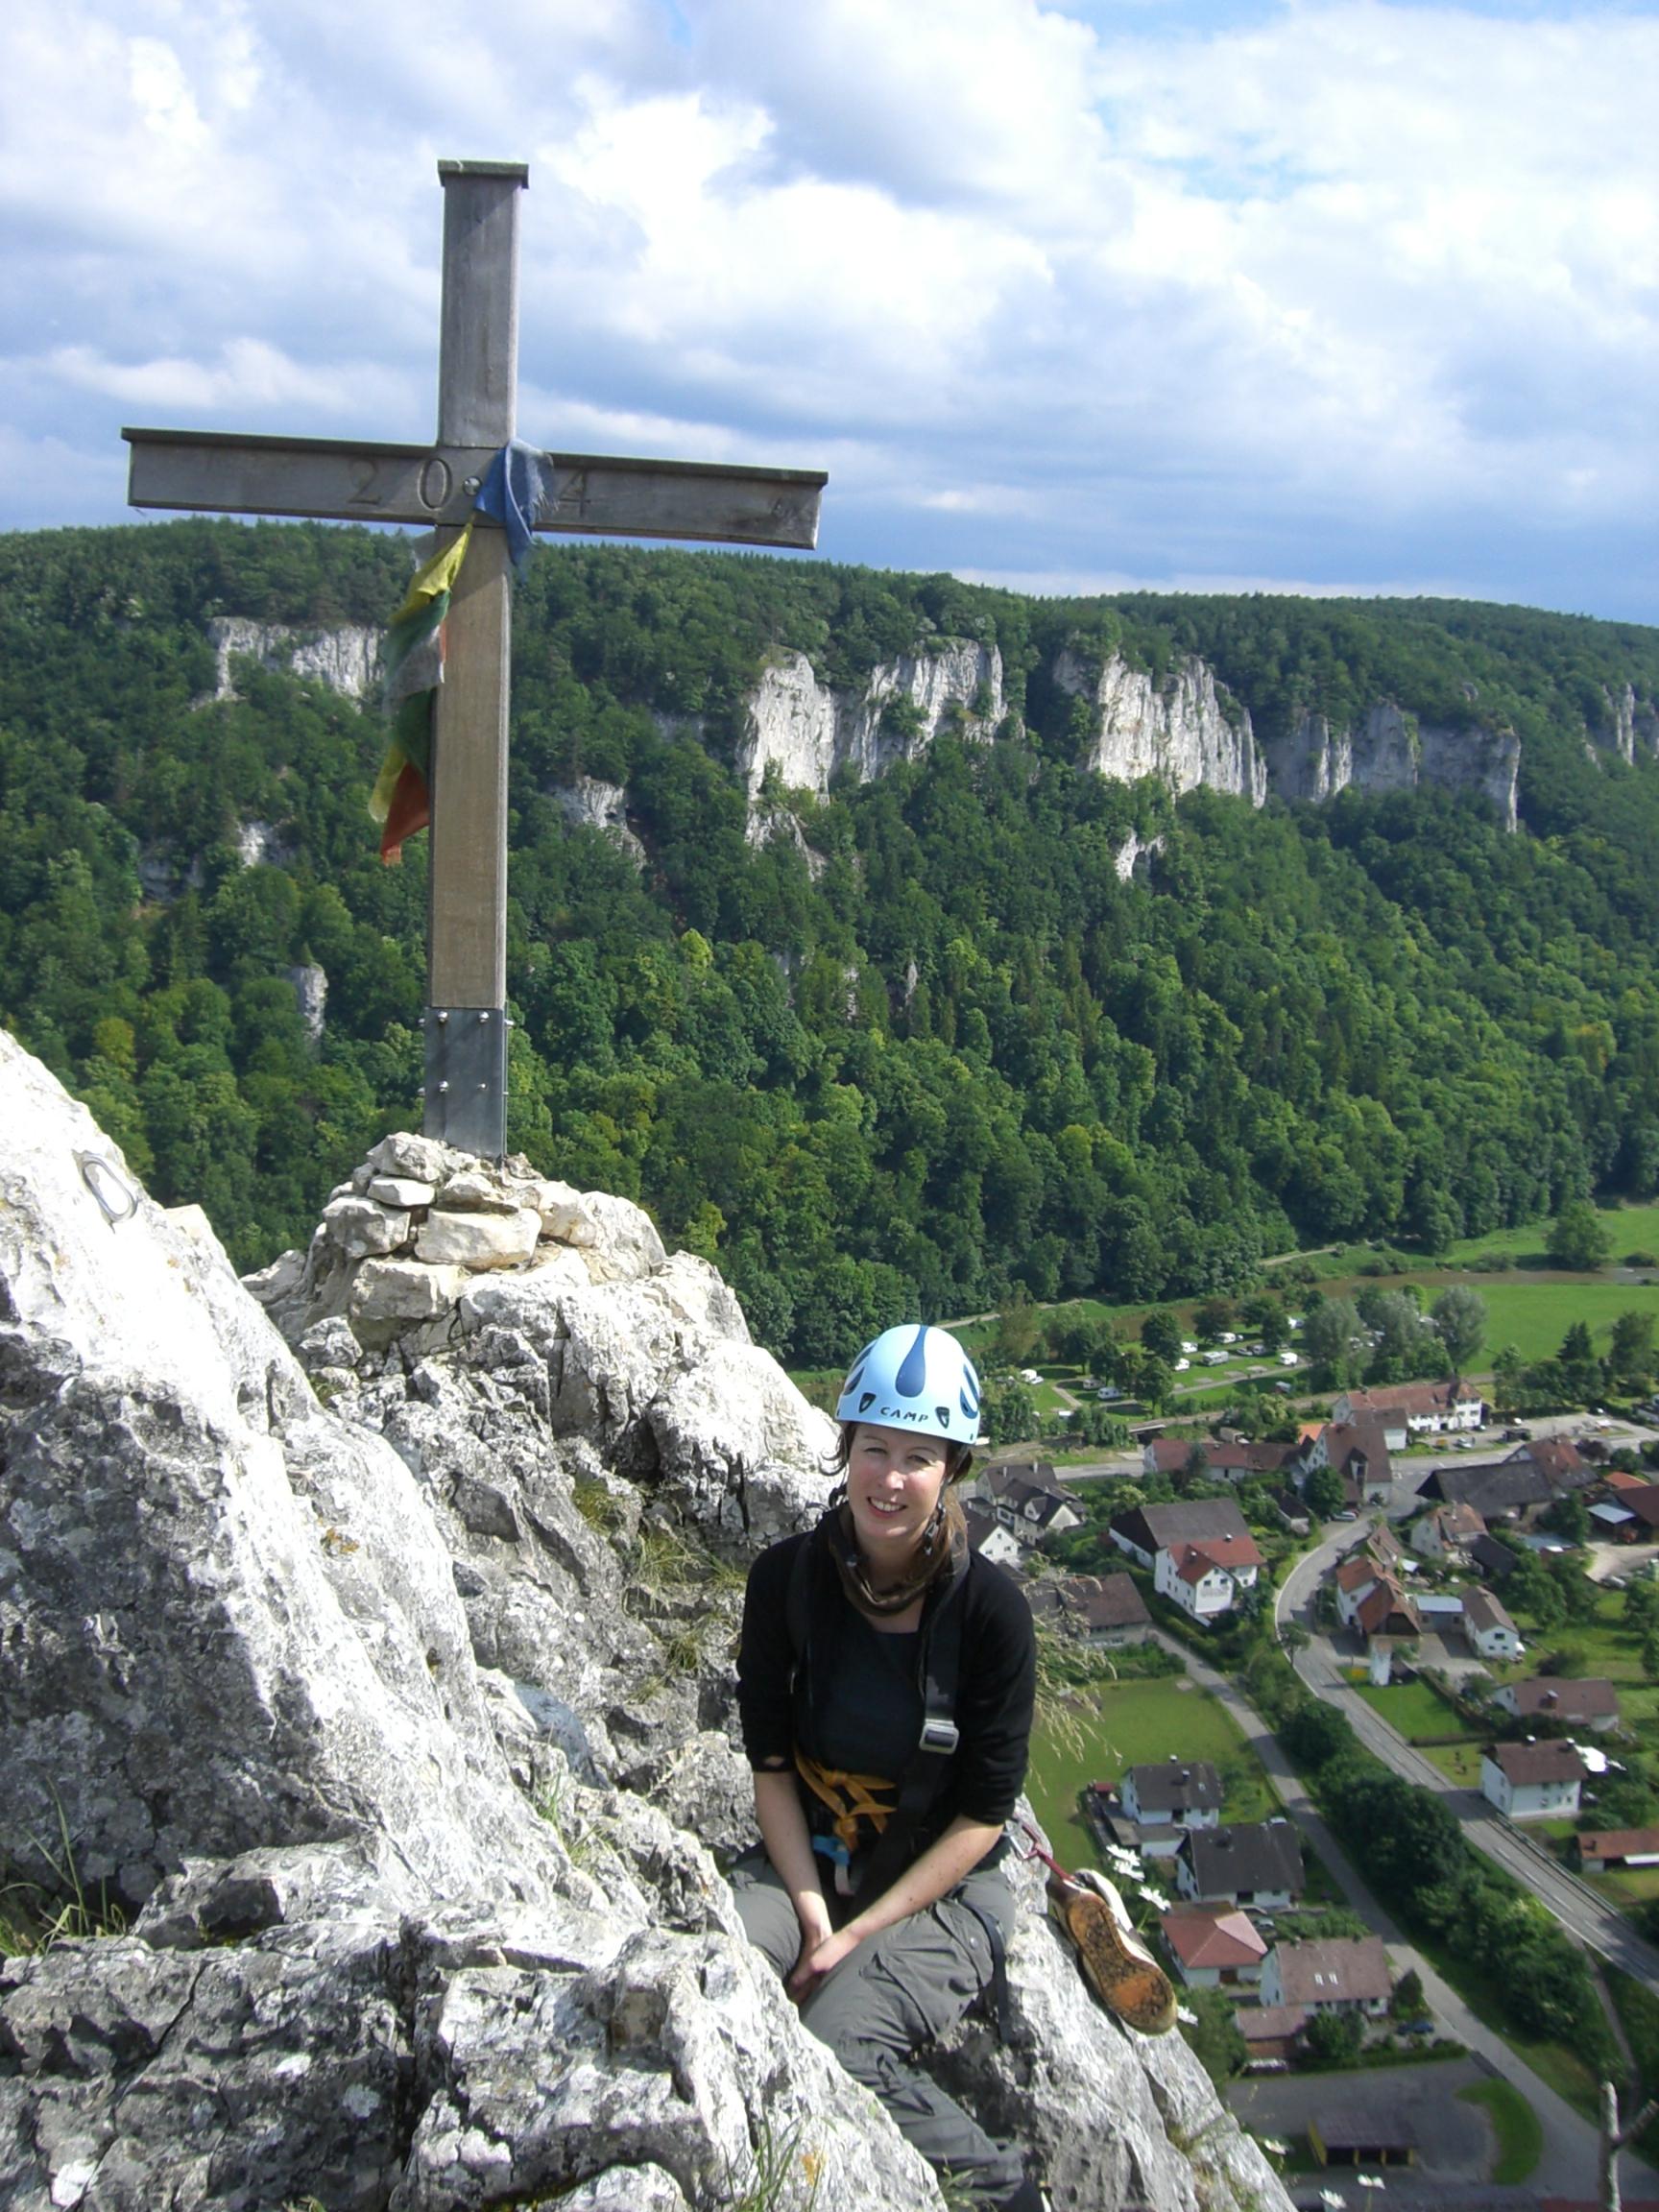 Stephie am Gipfelkreuz des Stuhlfels im Donautal